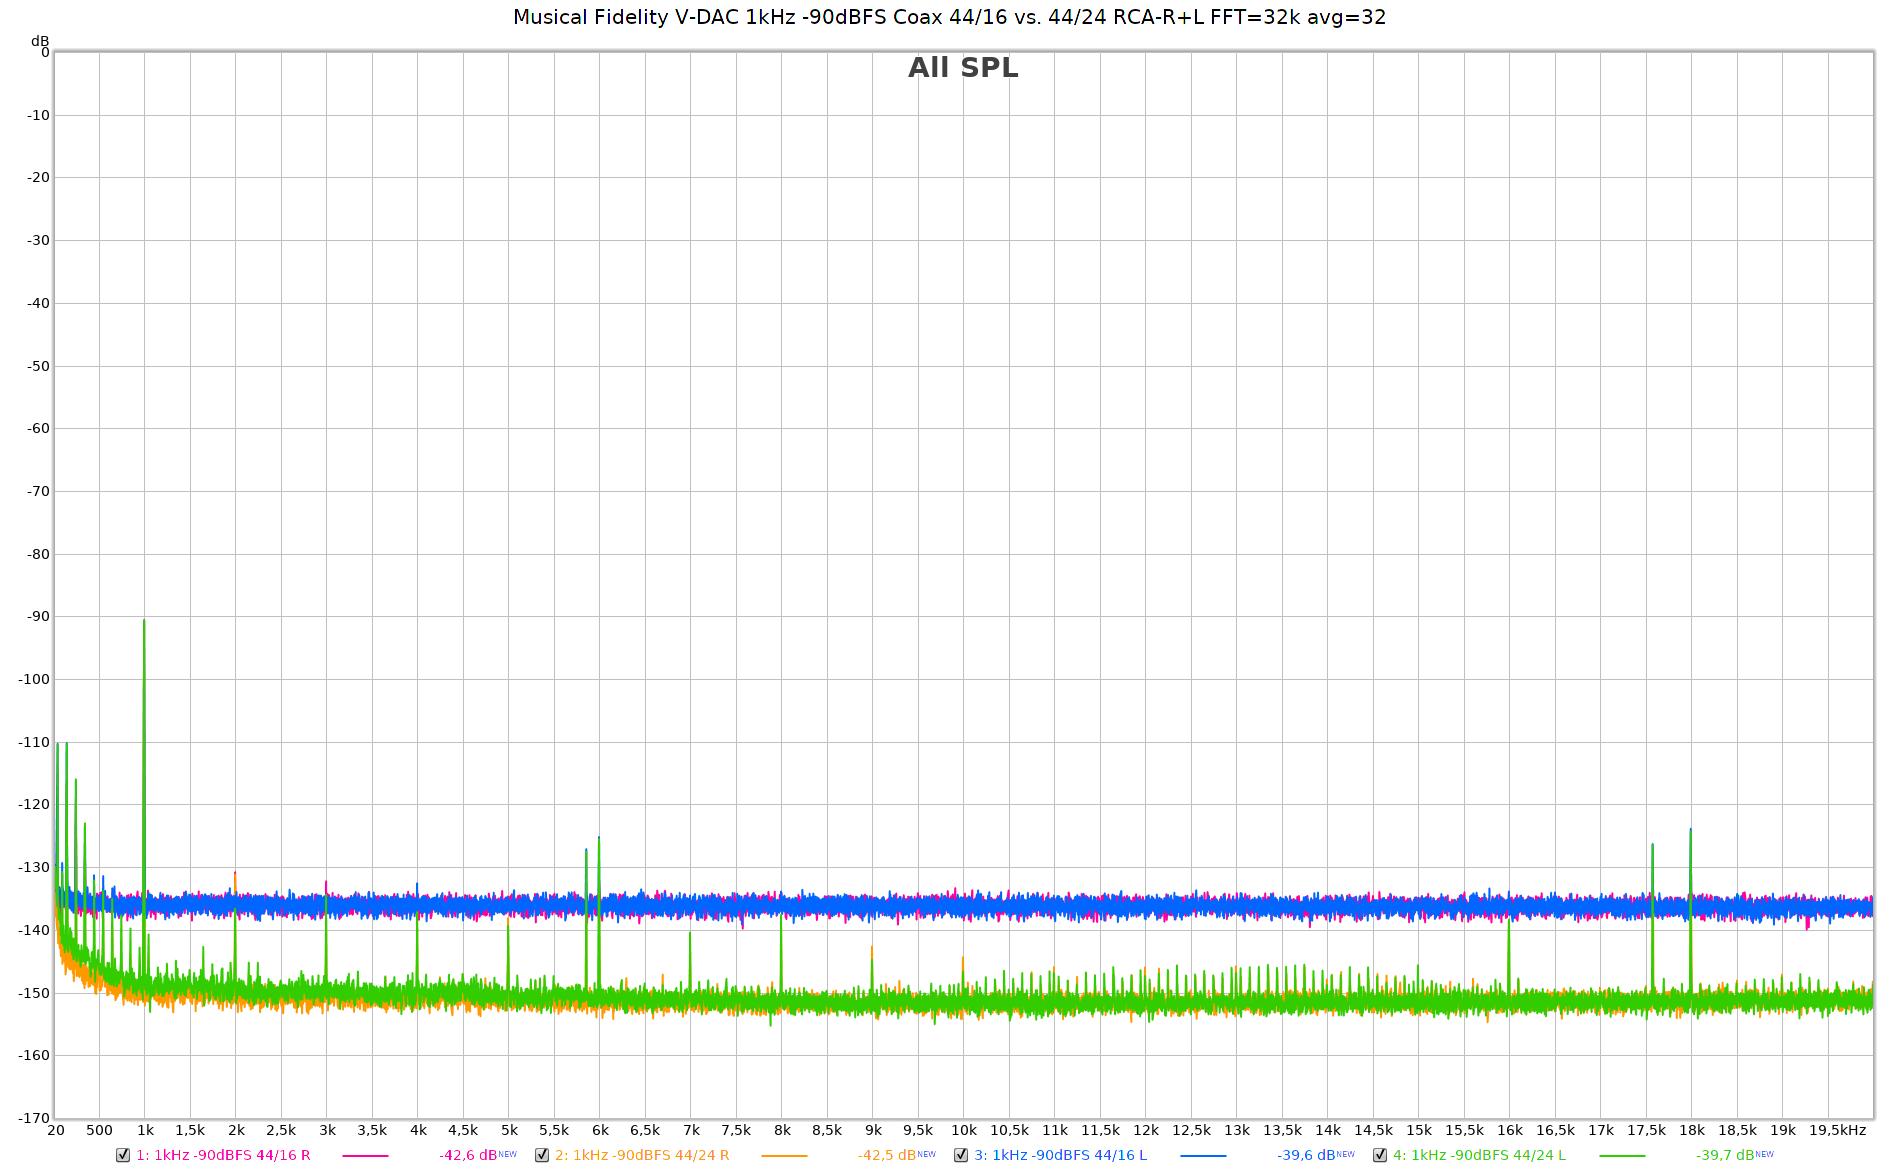 Musical Fidelity V-DAC 1kHz -90dBFS Coax 44-16 vs 44-24 RCA-R+L FFT=32k avg=32.png